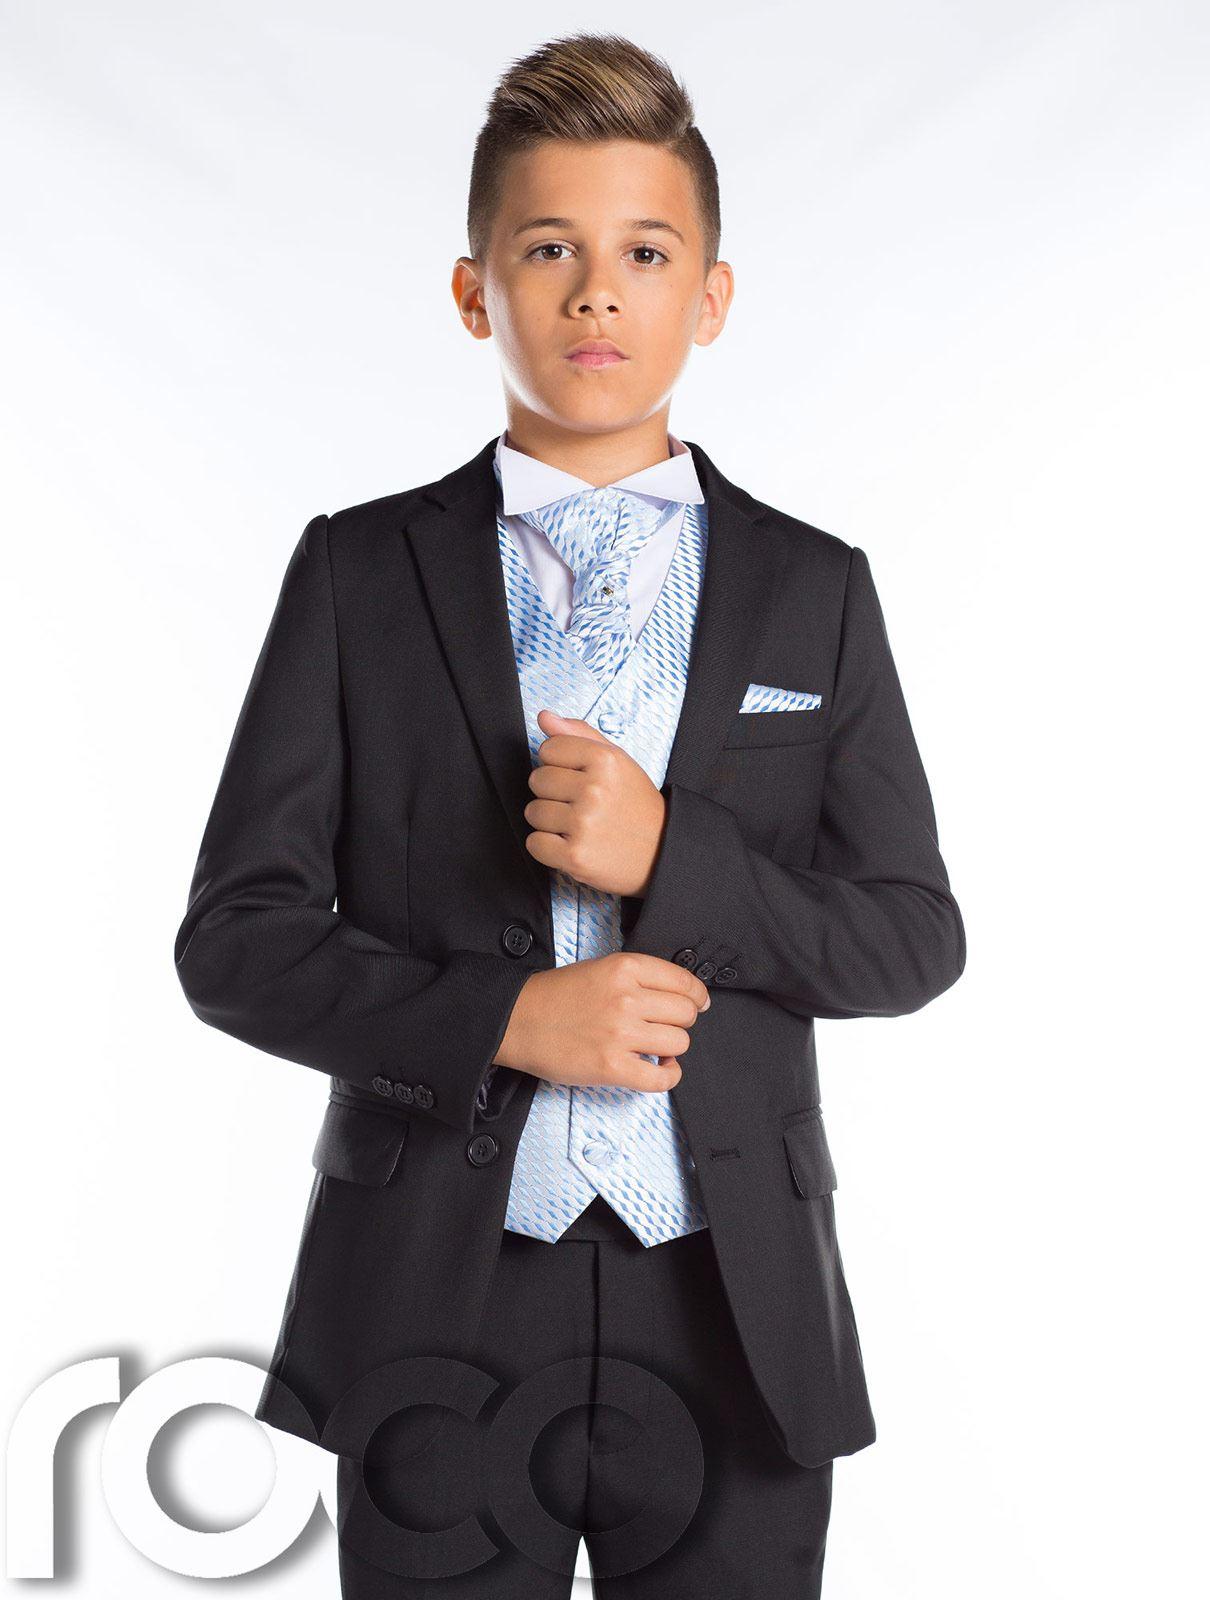 Boys Wedding Suit, Black Prom Suit, Page Boy Outfit, Boys Slim Fit ...